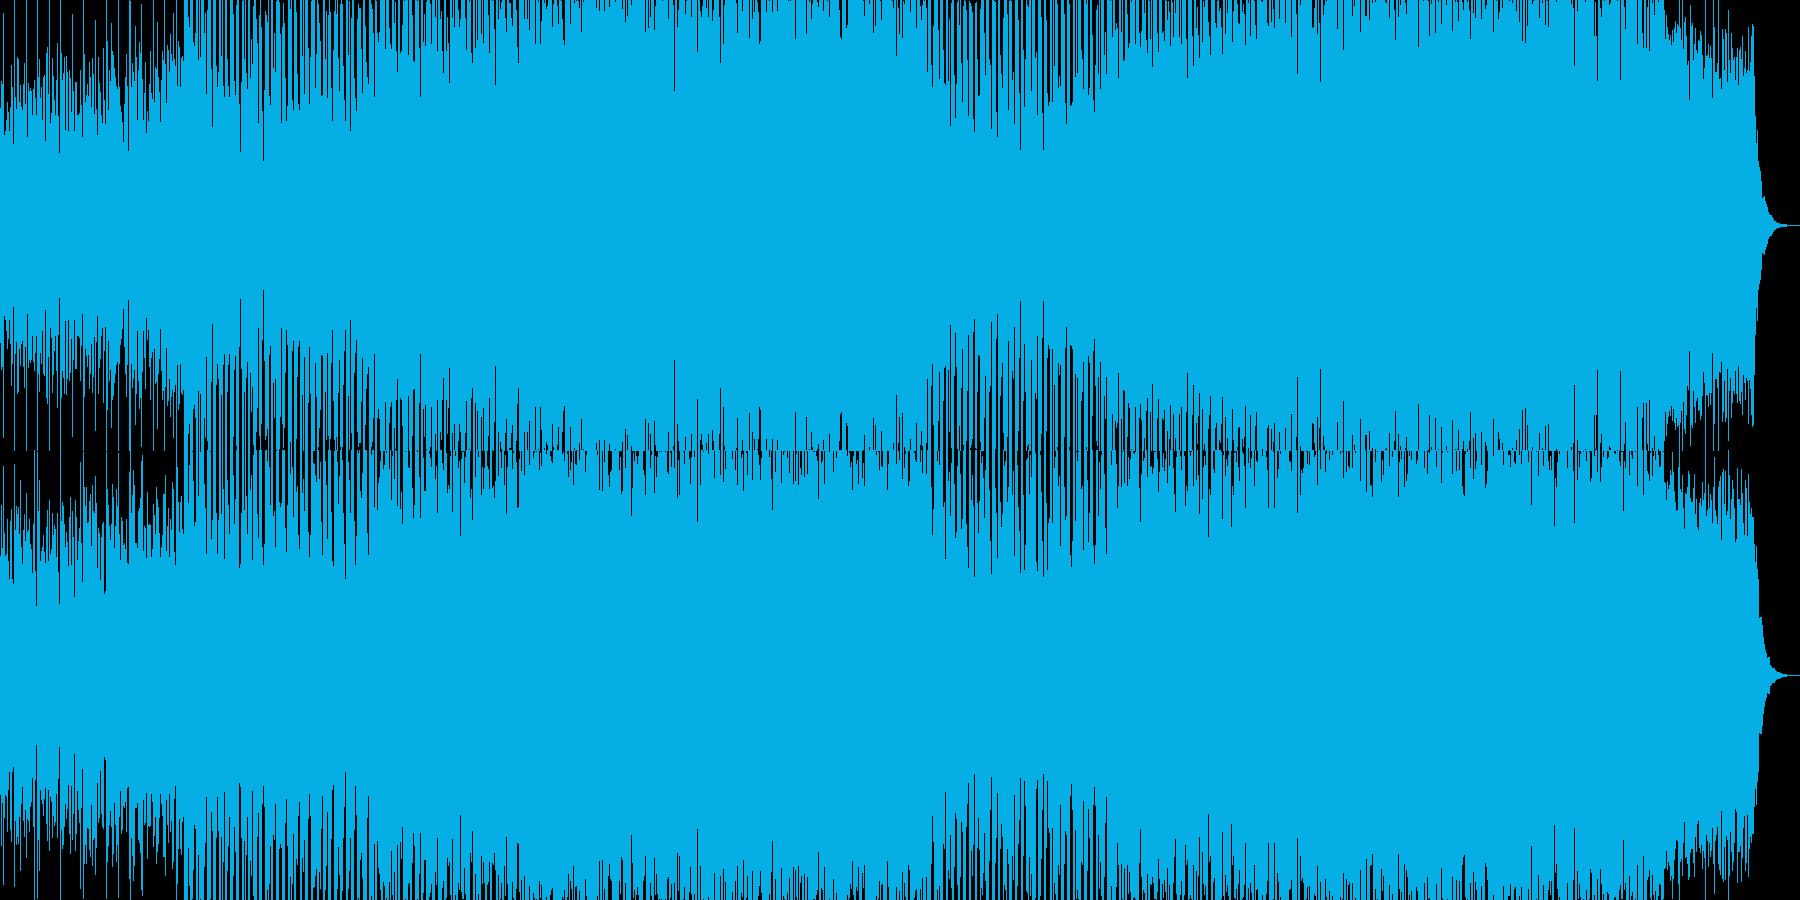 EDMクラブ系ダンスミュージック-93の再生済みの波形